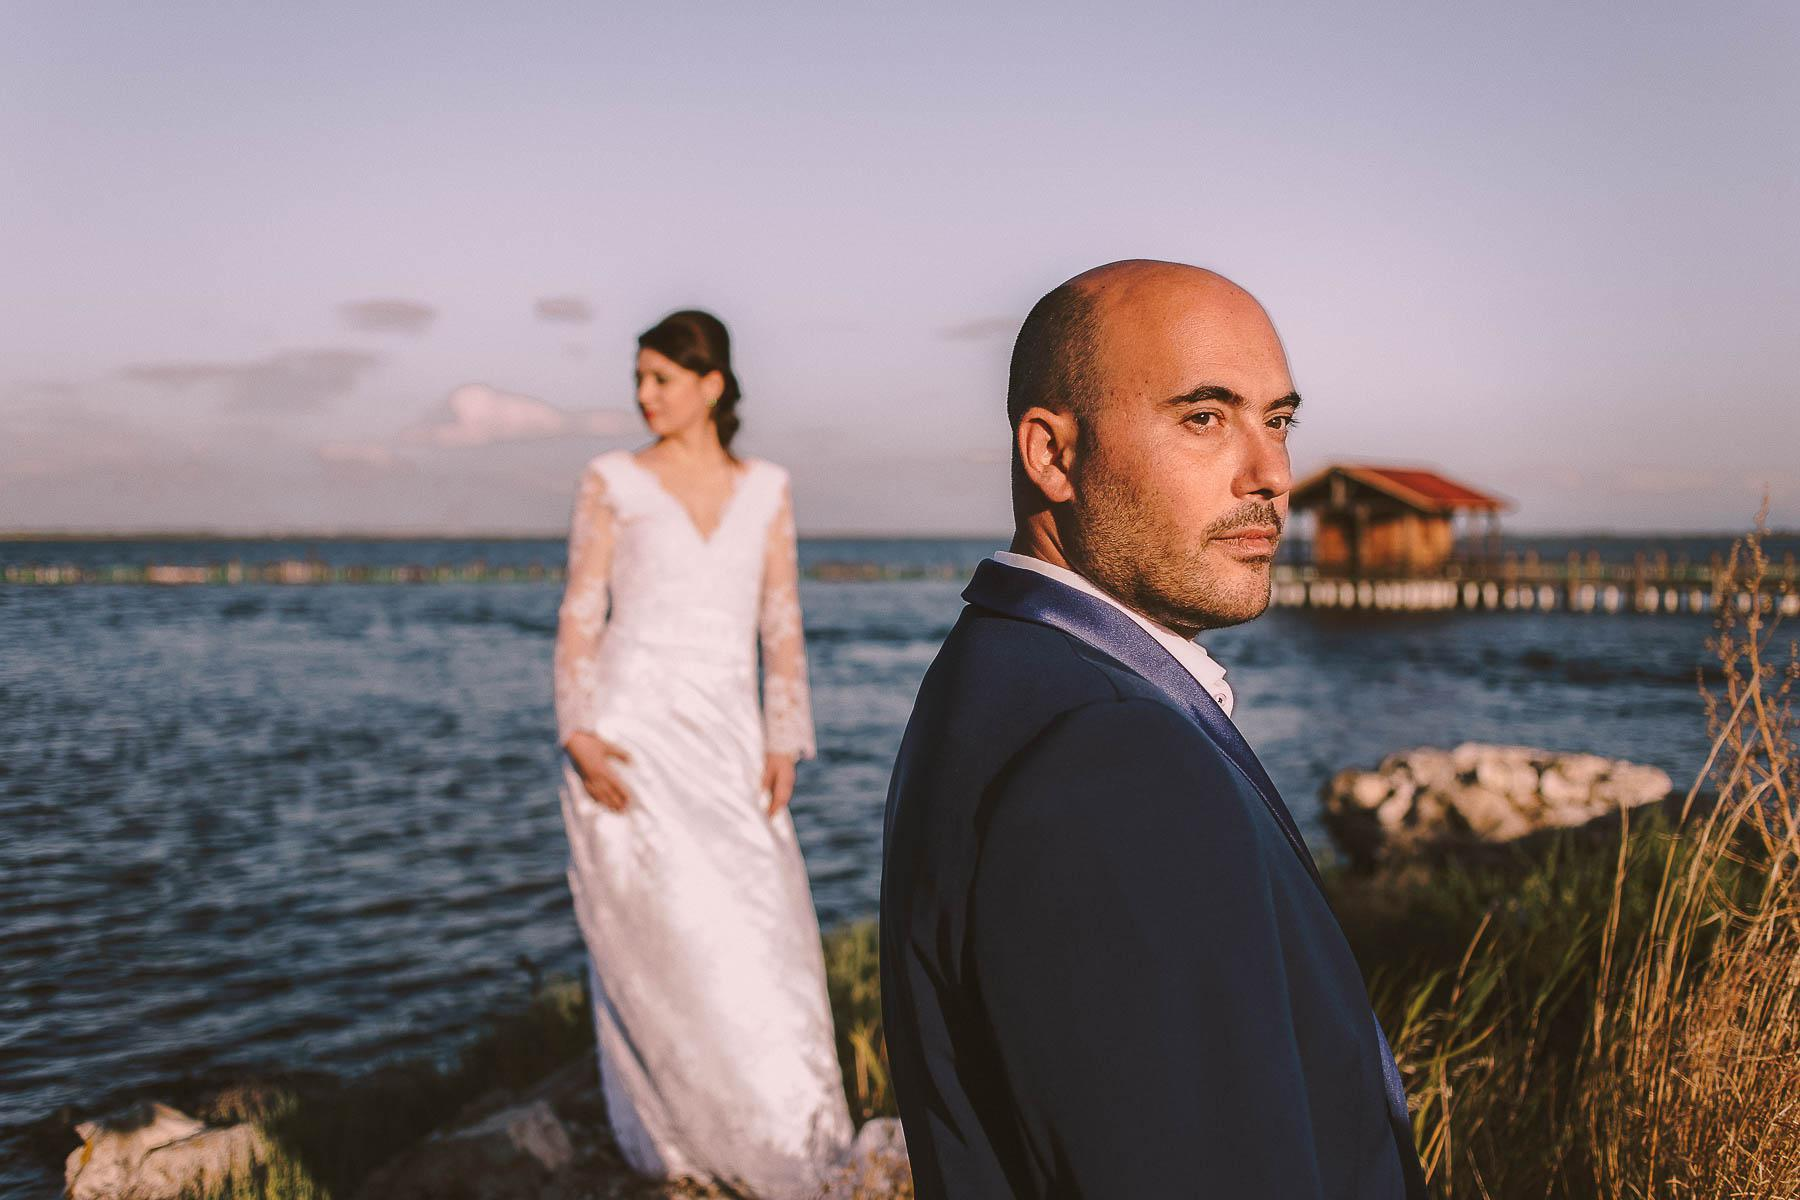 destination-wedding-in-lake-aitoliko-messolonghi-in-greece090